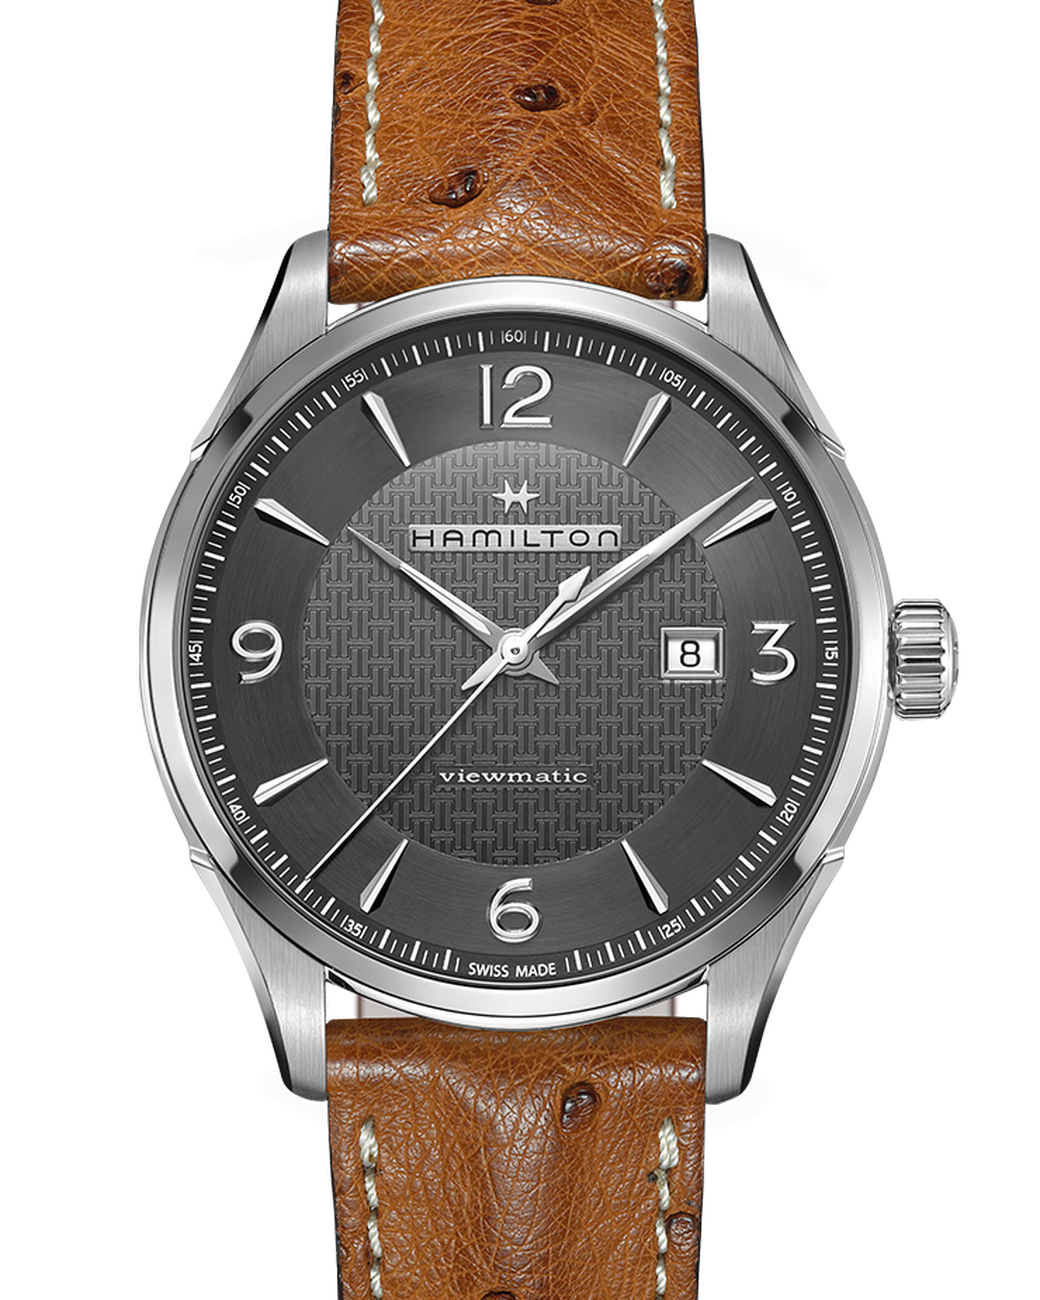 hamilton jazzmaster viewmatic watch